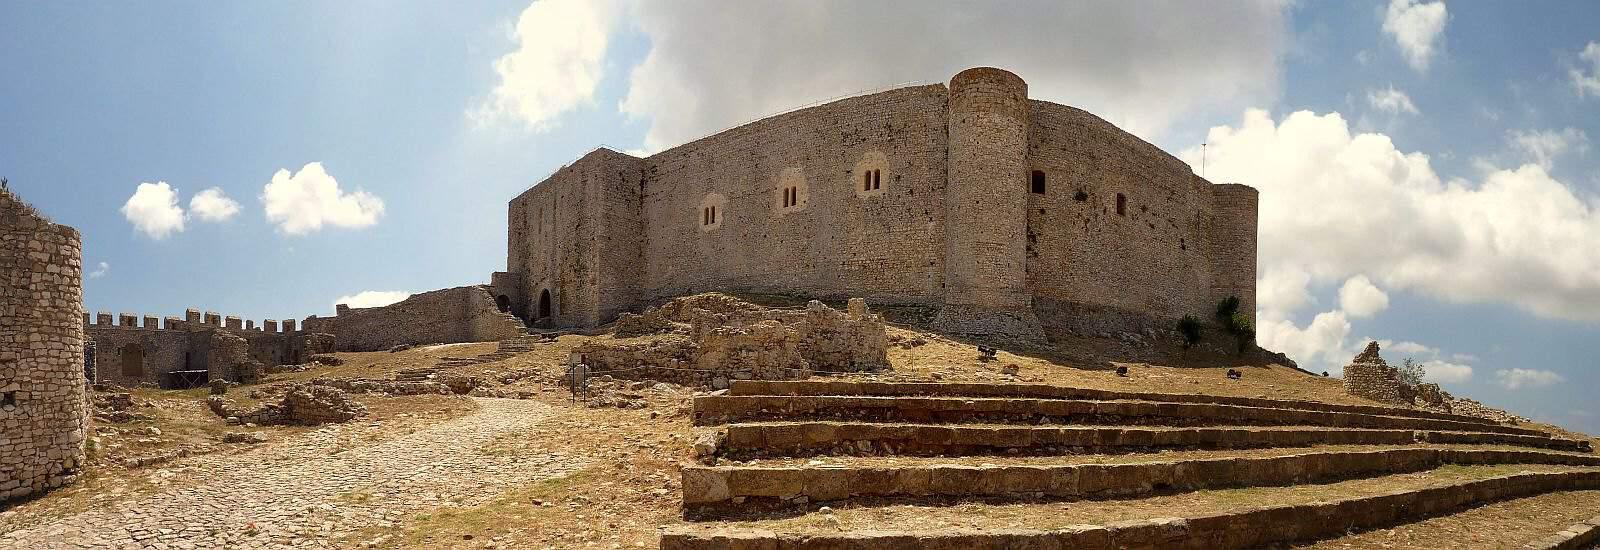 Chlemoutsi Castles Peloponnese